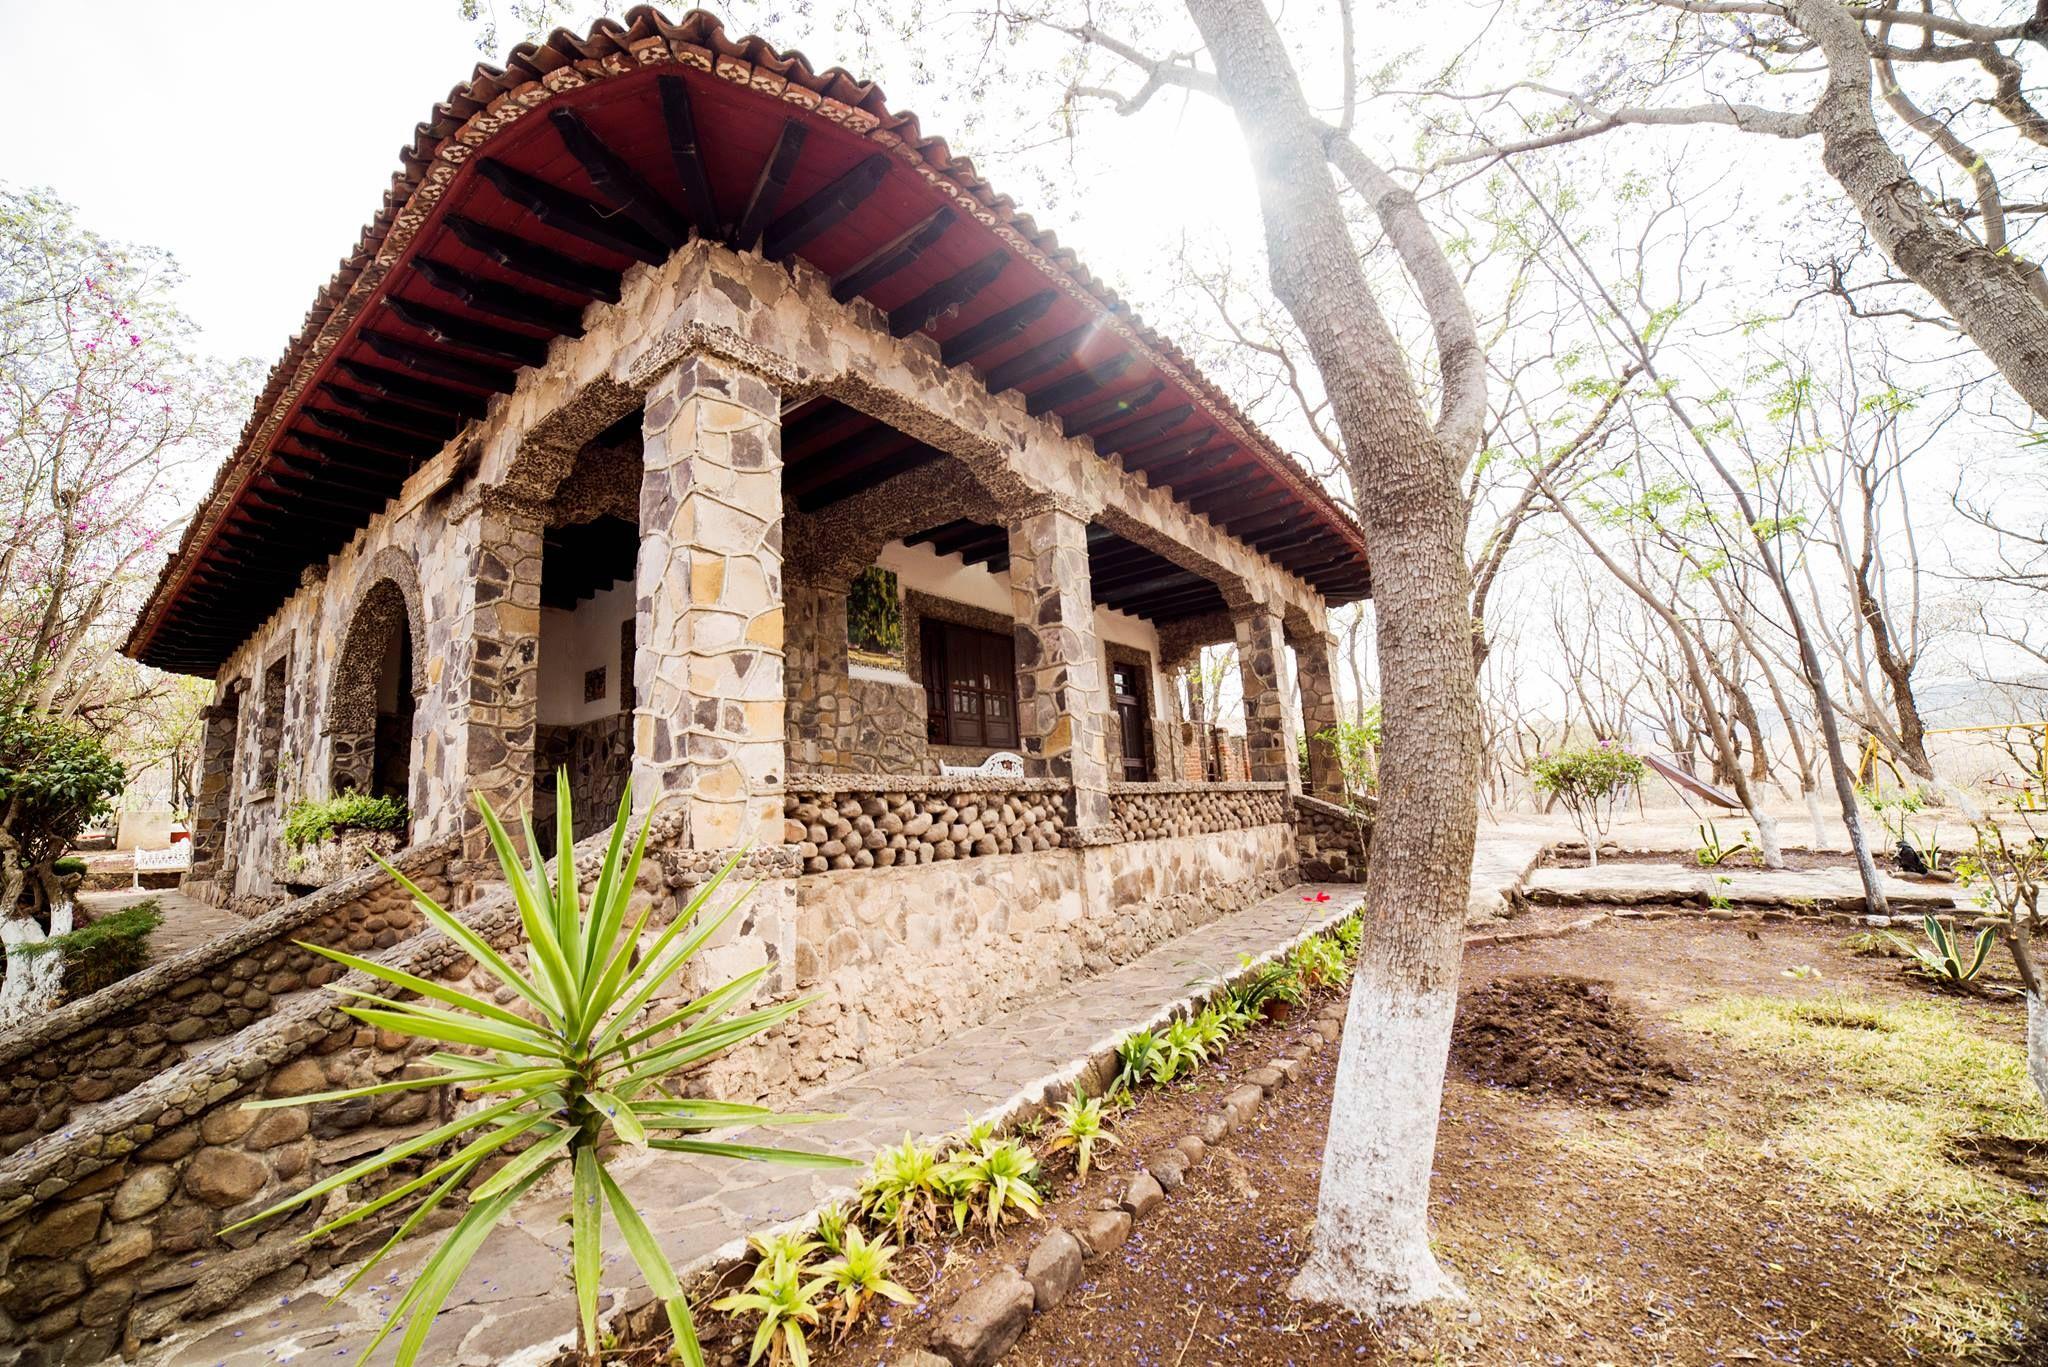 La icónica casita de piedra en Jiquilpan.